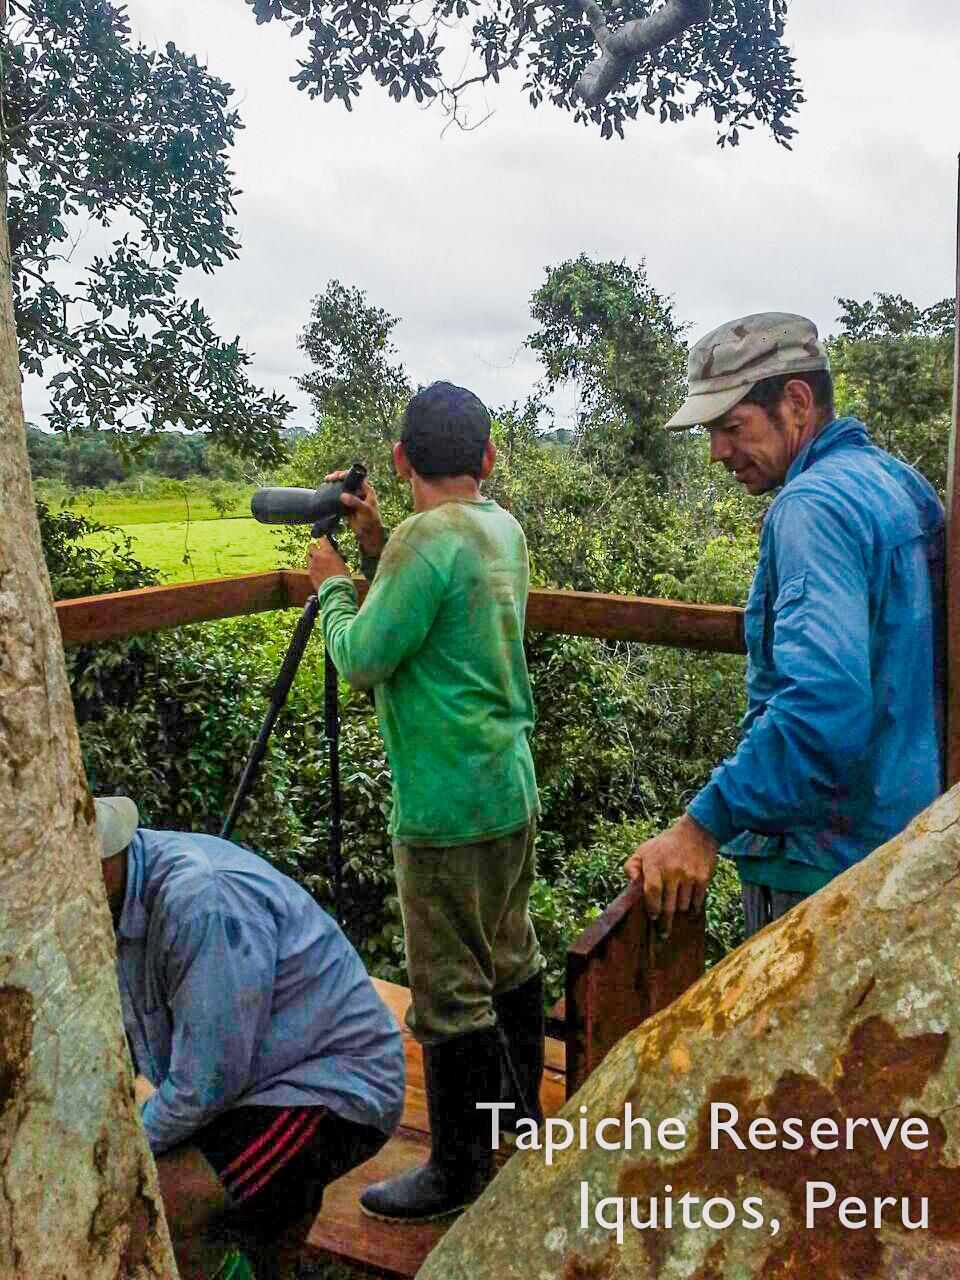 Tapiche-Amazon-Jungle-Tour-Peru-canopy-observation-tower-8.jpg